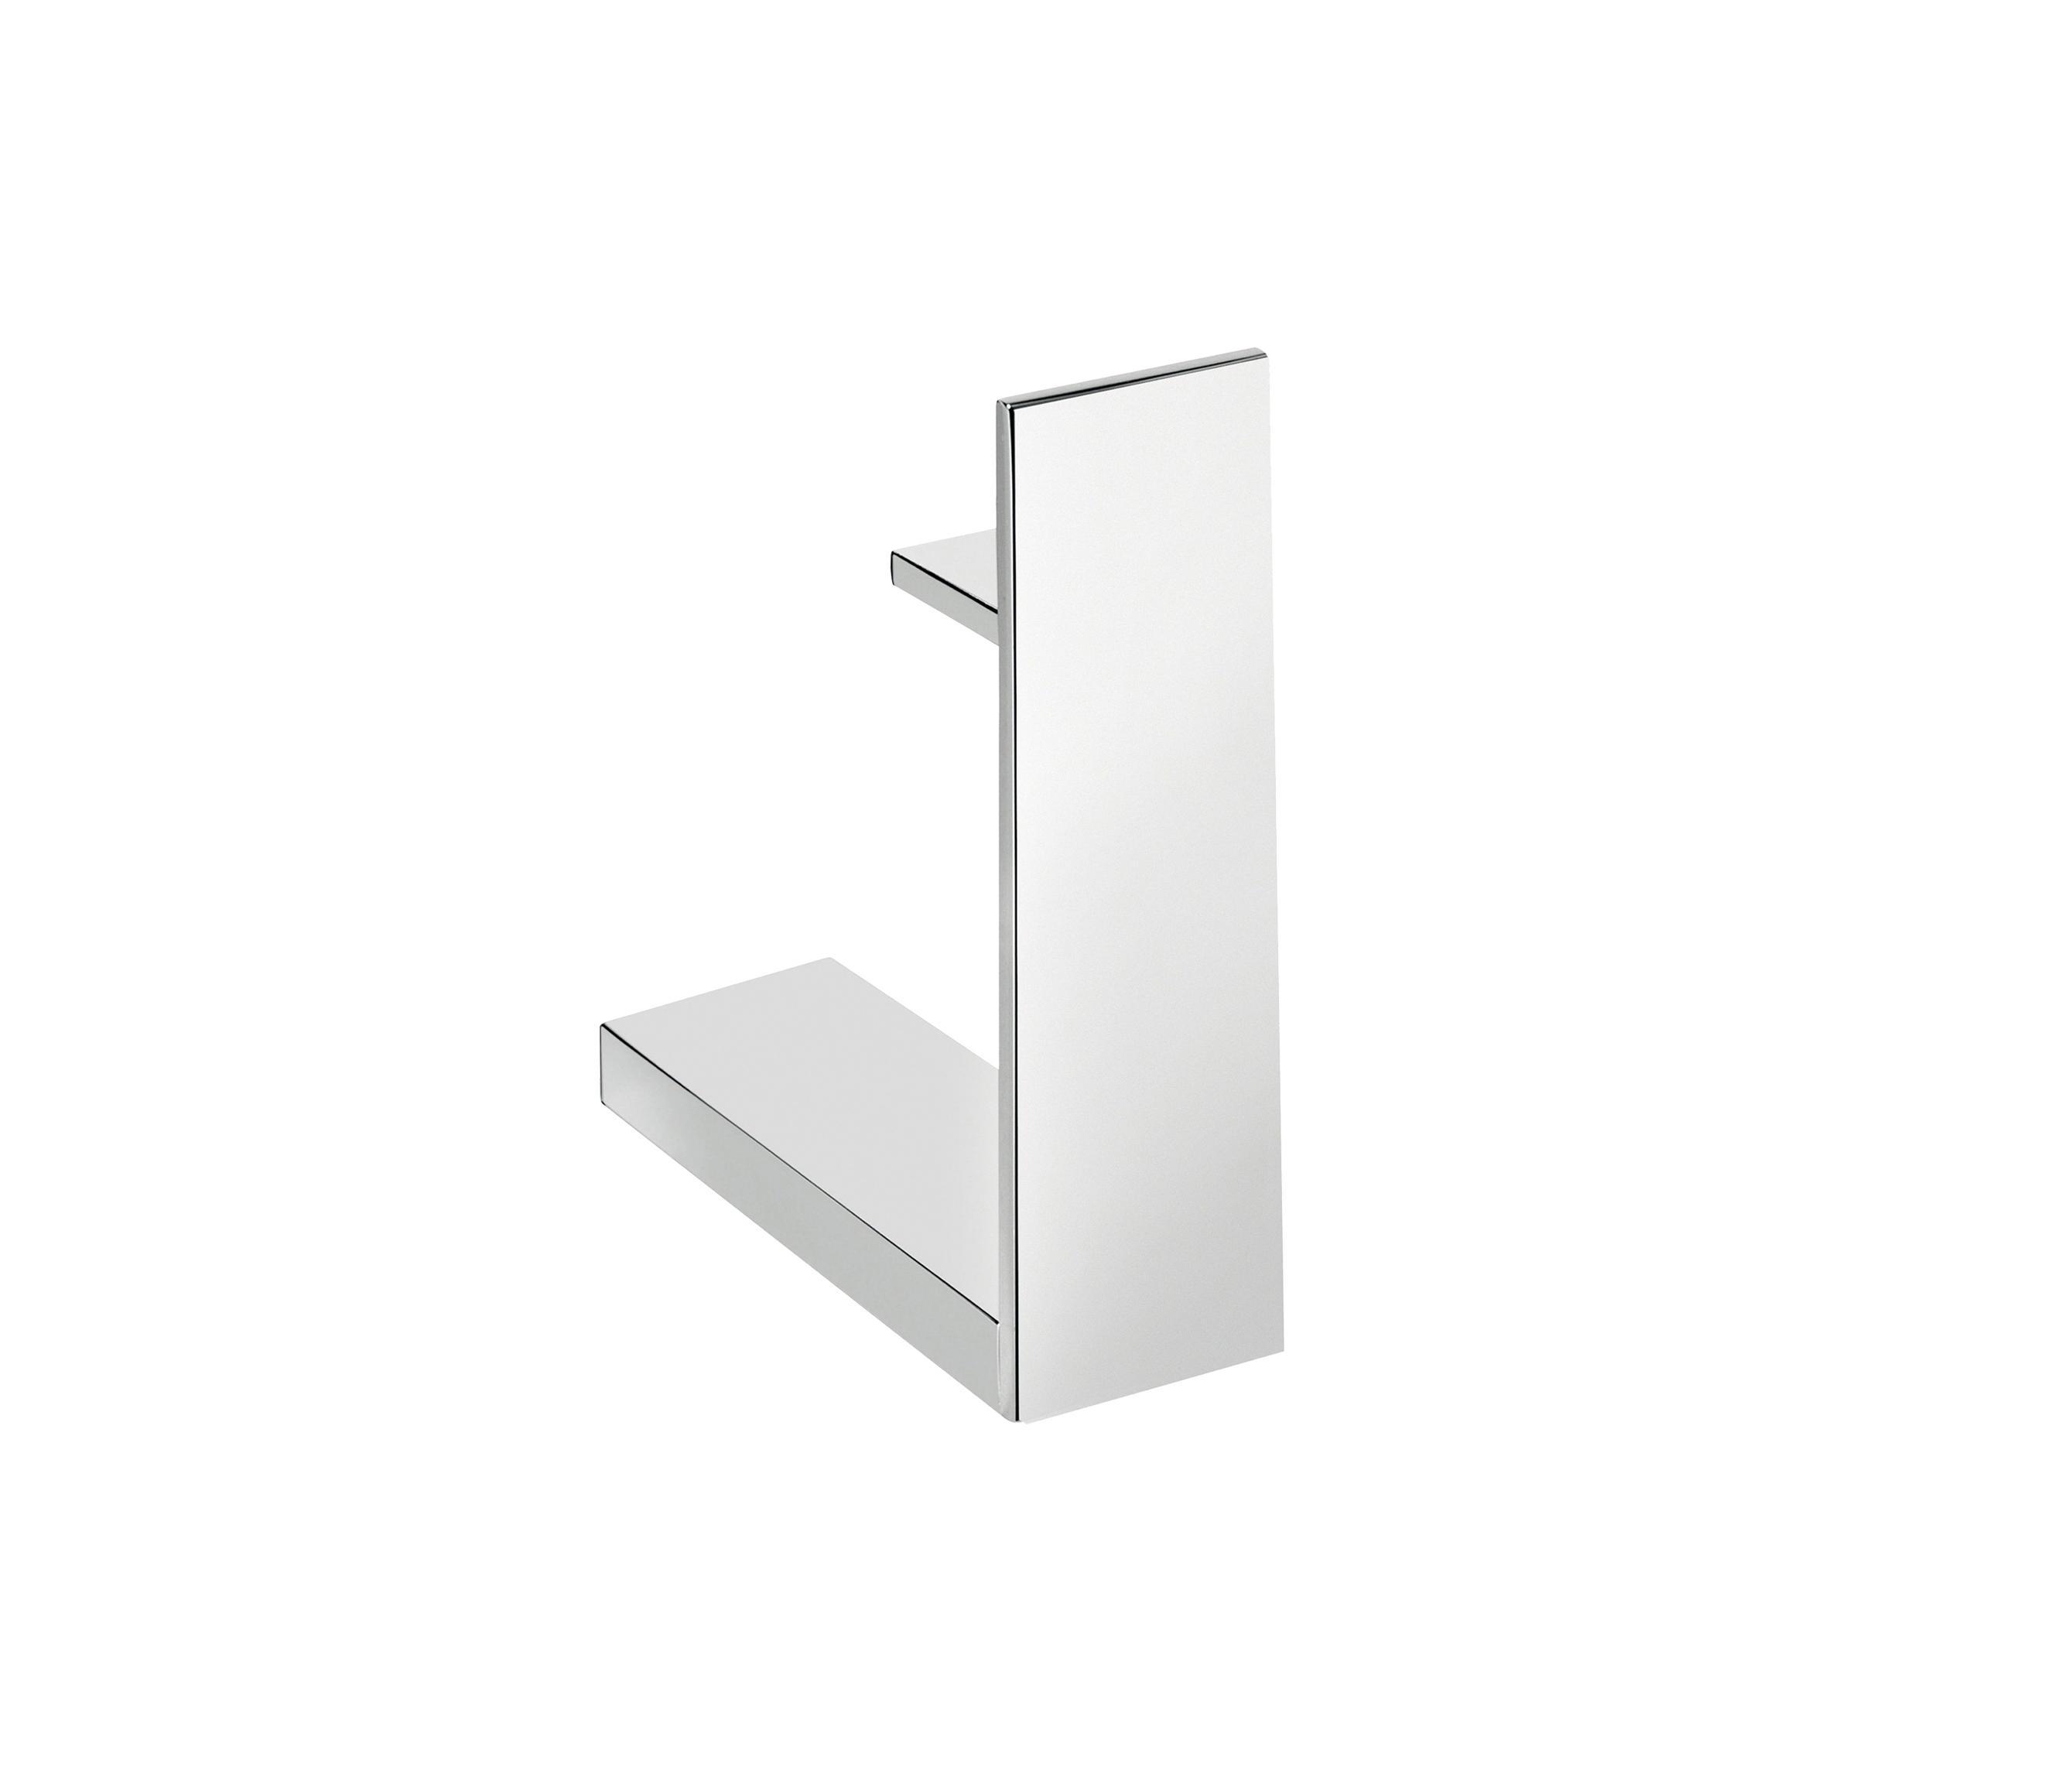 Moderne bad accessoires toilettenpapierhalter von fir for Moderne accessoires